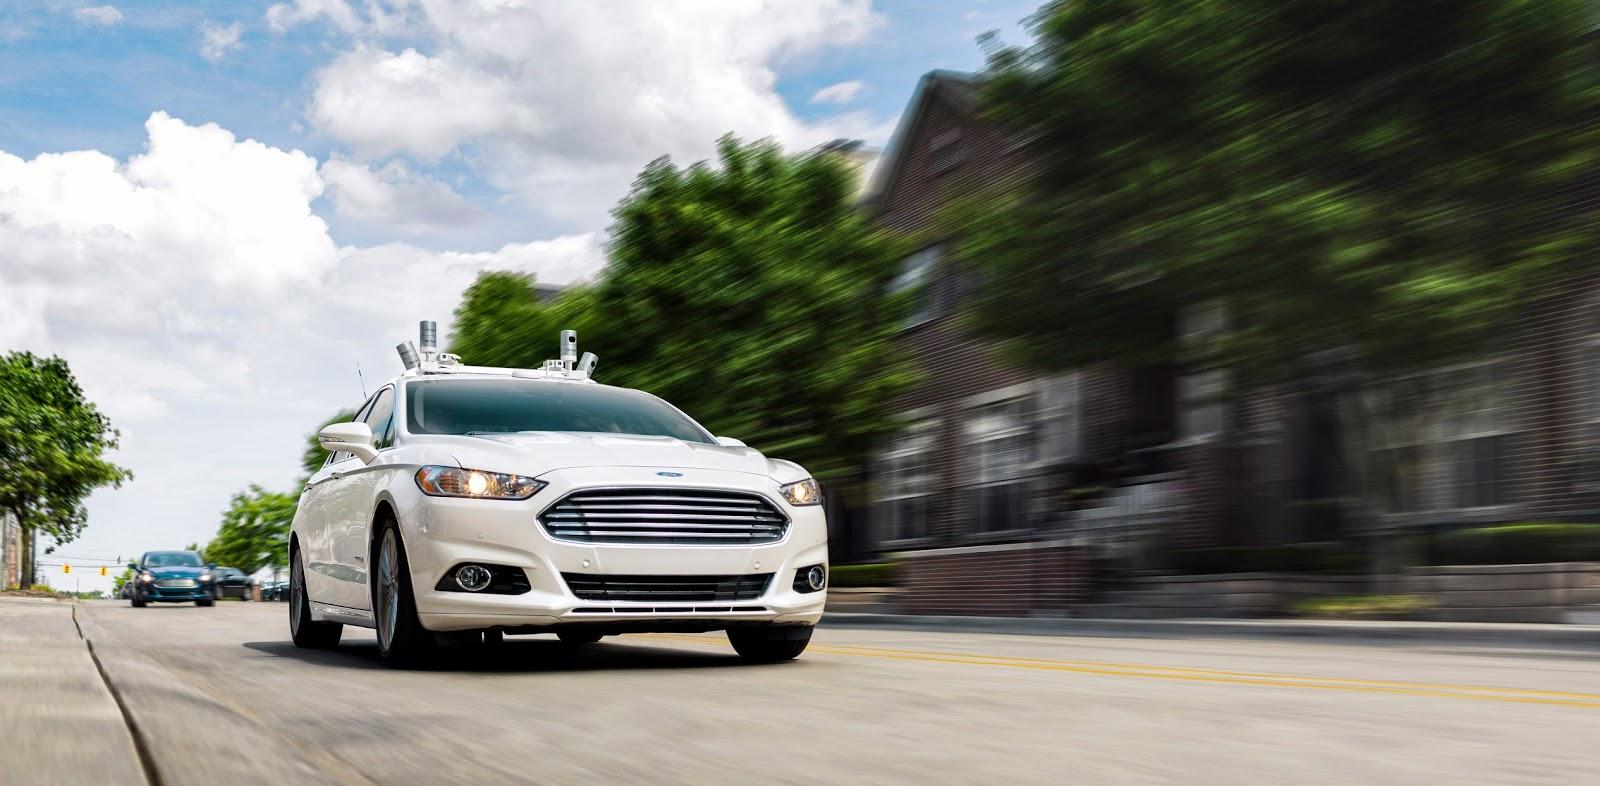 Ford Fusion AV 01 HR 1 Η Ford στοχεύει να βγάλει σε μαζική παραγωγή ένα πλήρως αυτόνομο όχημα το 2021 Autonomous Driving, Ford, videos, Τεχνολογία